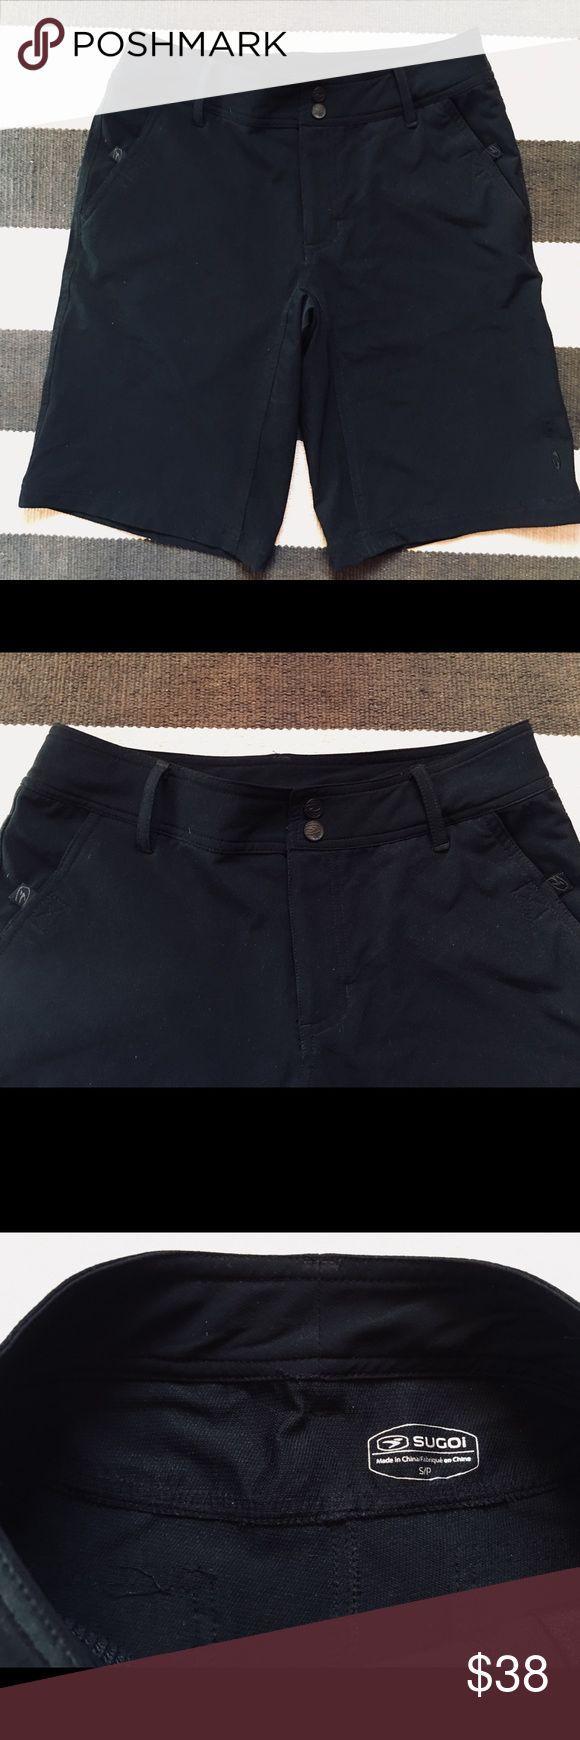 Women's Sugoi mountain bike shorts 🌼 Sugoi mountain bike shorts 🌞 like new never used 😍 SUGOI Shorts Bermudas